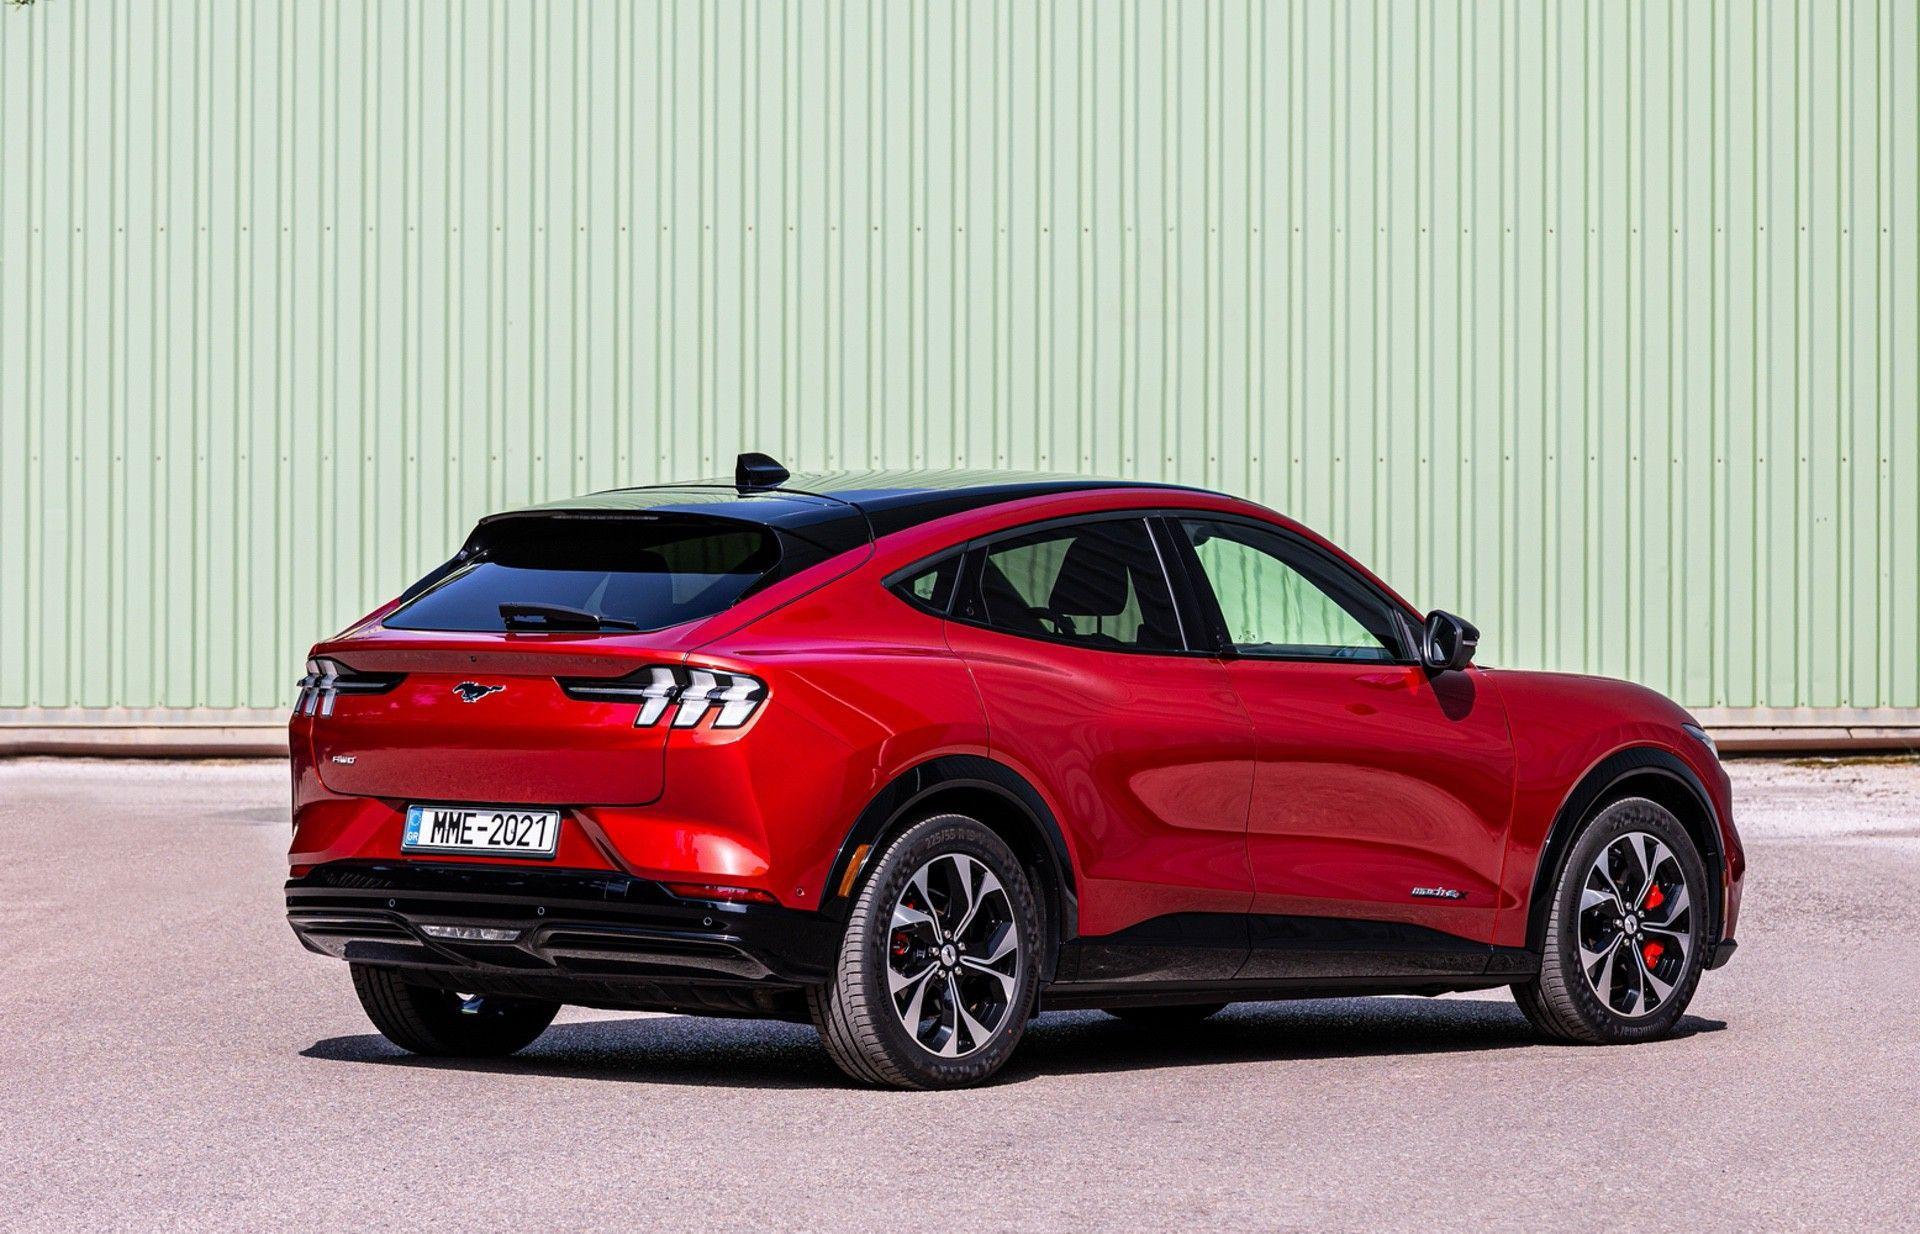 Ford_Mustang_Mach-E_greek_presskit-0047